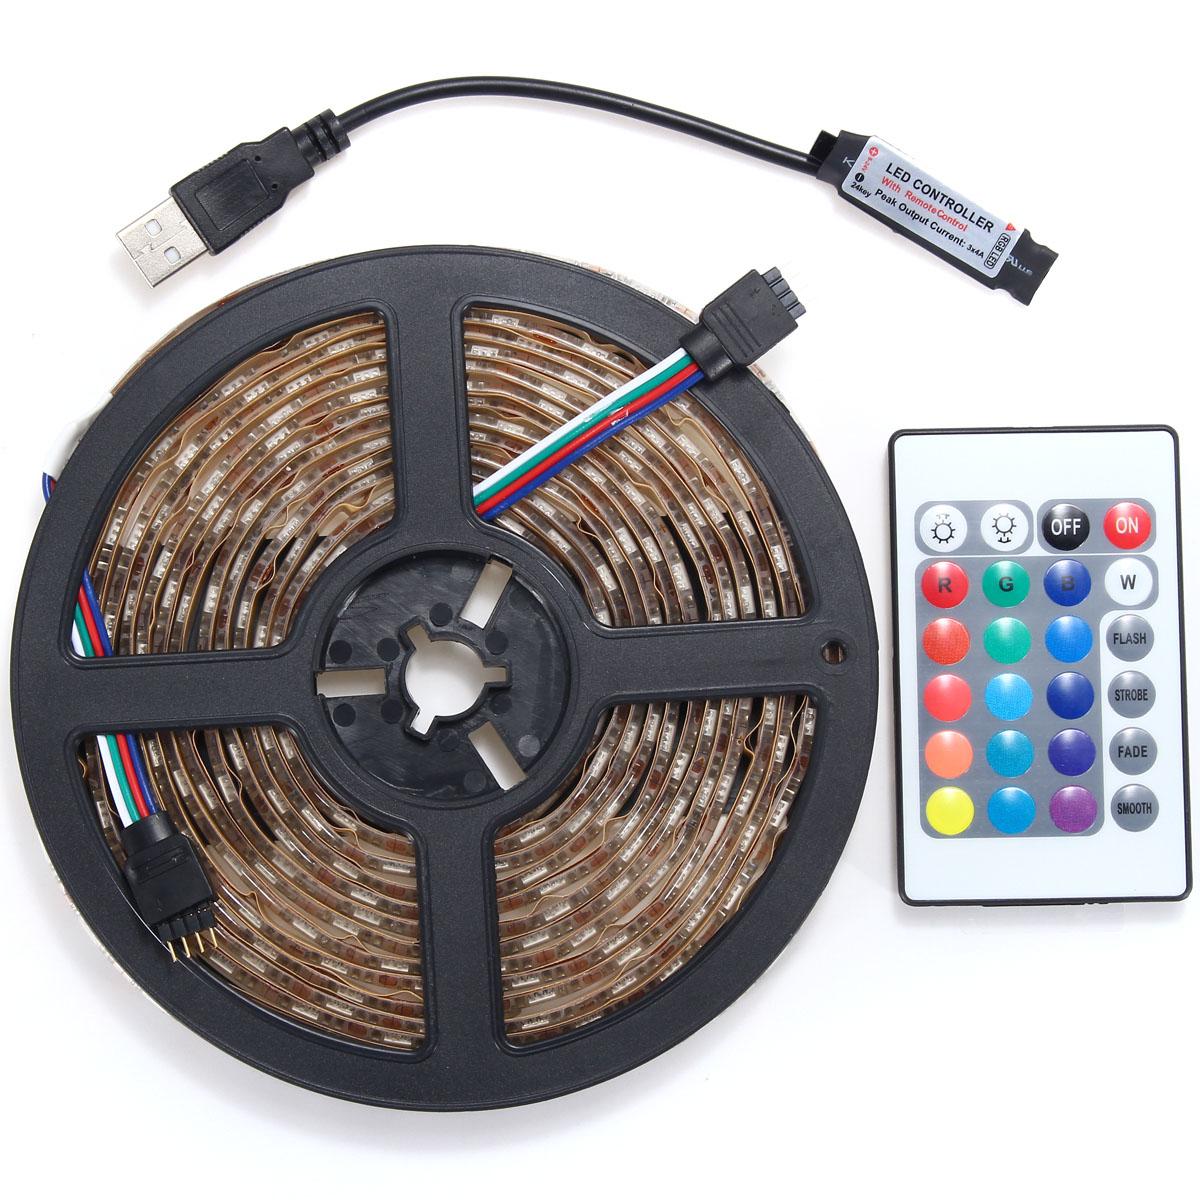 0.5/1/2/3/4/5M RGB SMD5050 Waterproof LED Strip Light TV Back Lighting Kit + USB Remote Control DC5V